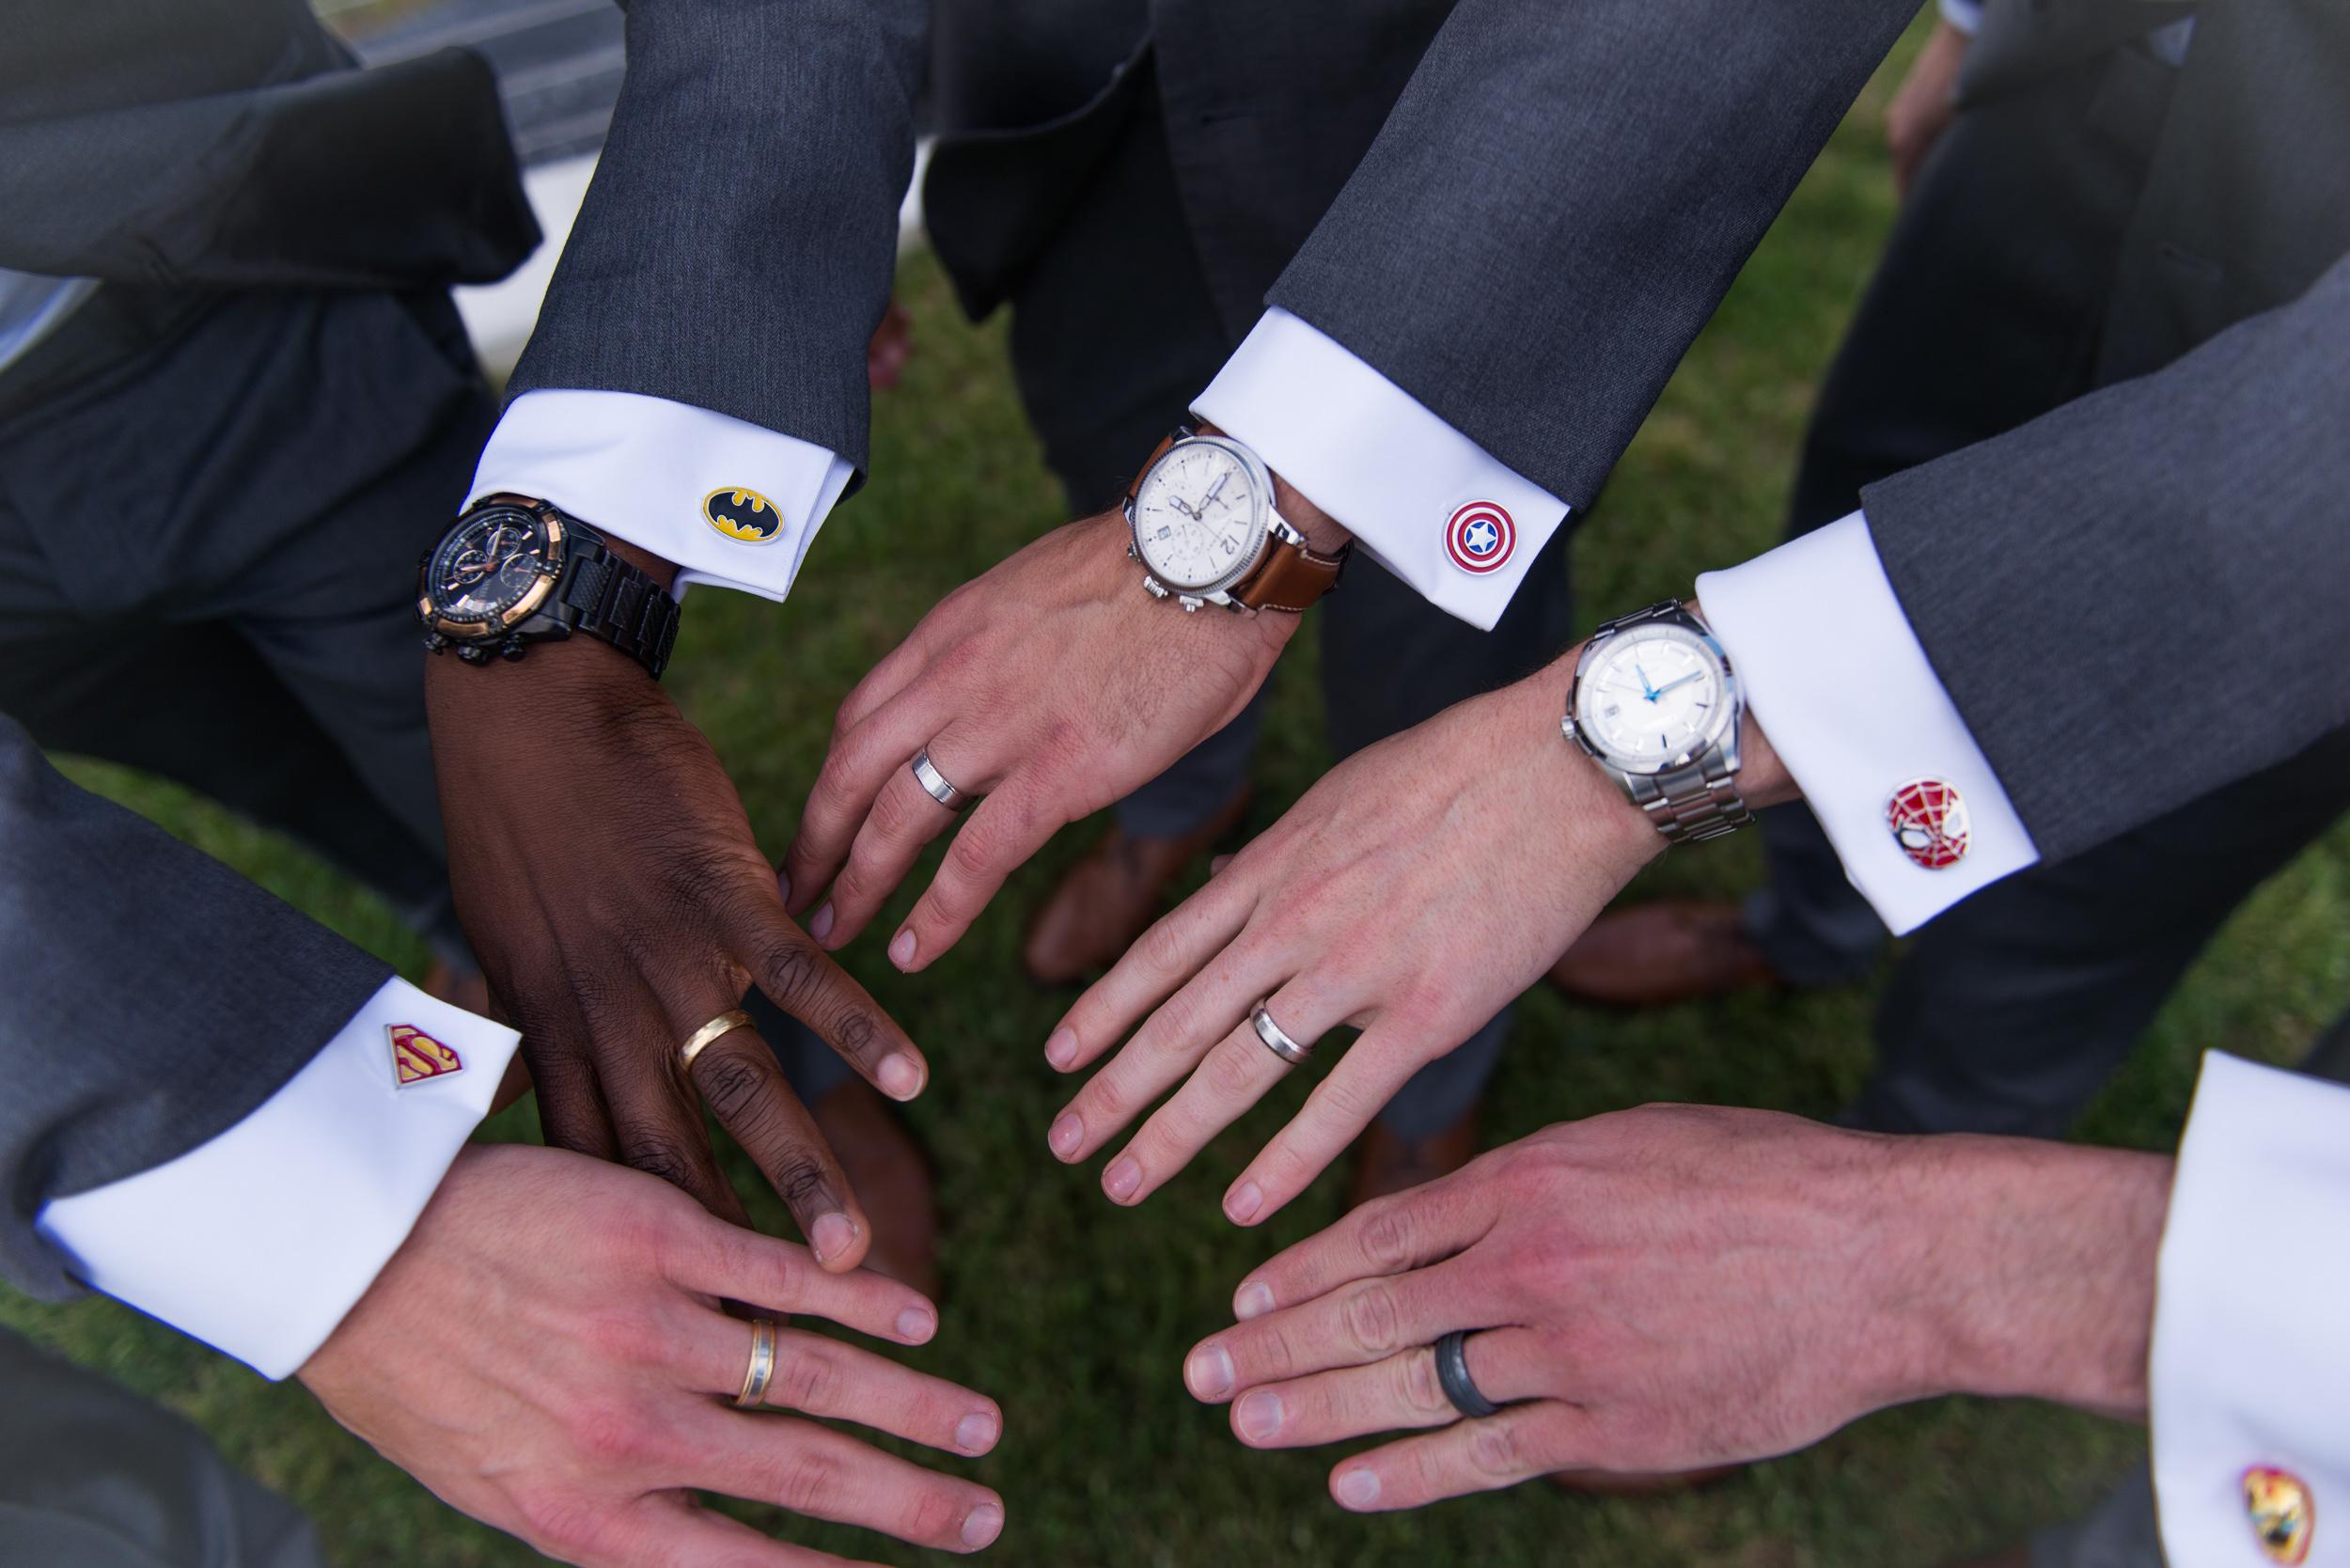 The groomsmen show off their superhero cufflinks and wedding rings during a wedding reception at Blue Valley Vineyard in Delaplane, Virginia